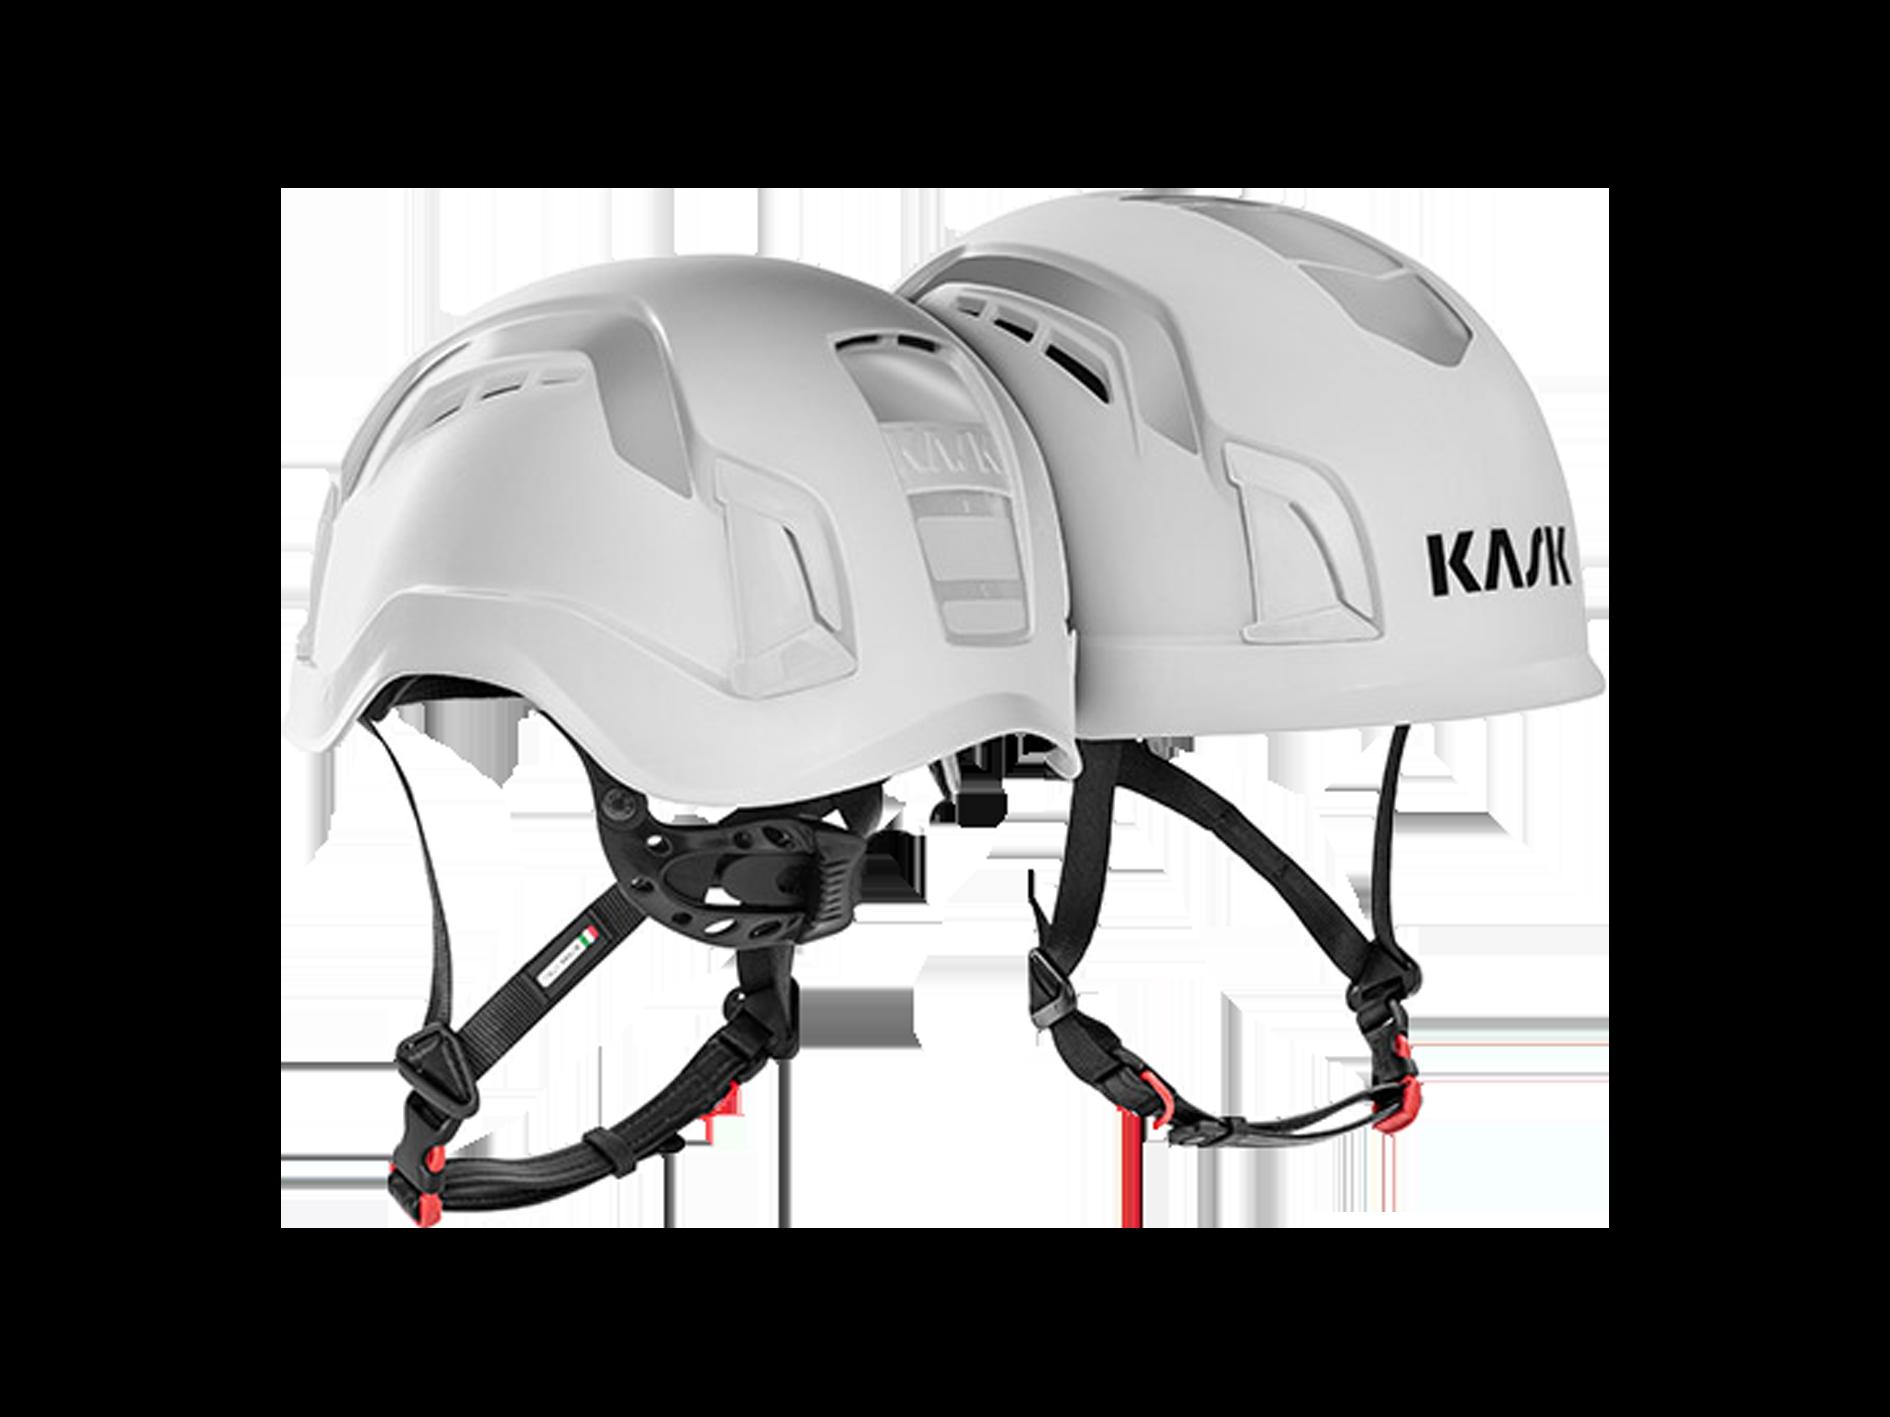 Kask Zenith Hi Viz Safety Helmet